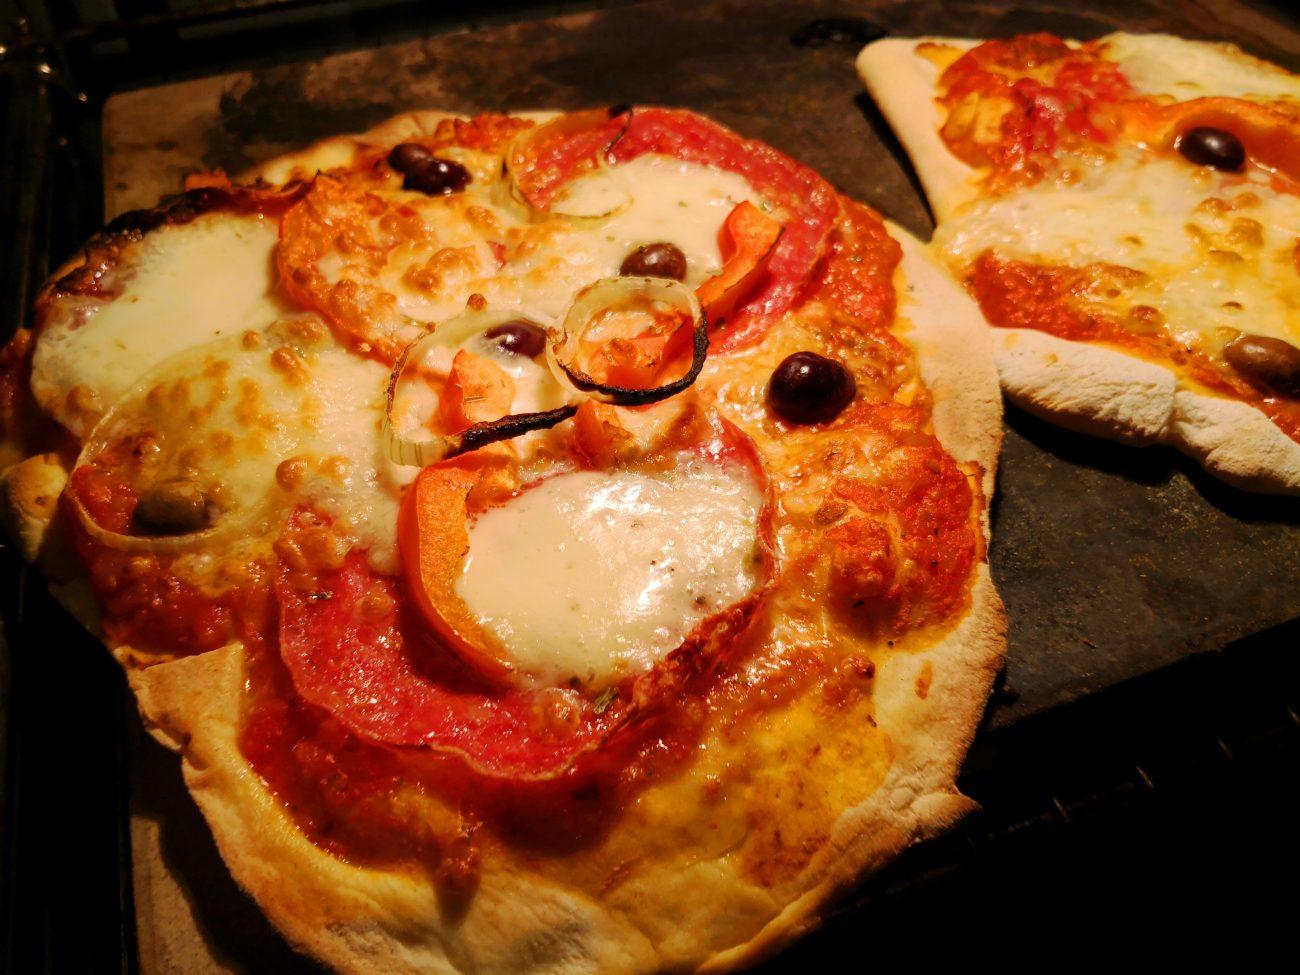 Pizza Pazza – Verrückte Pizza nach Art des Hauses